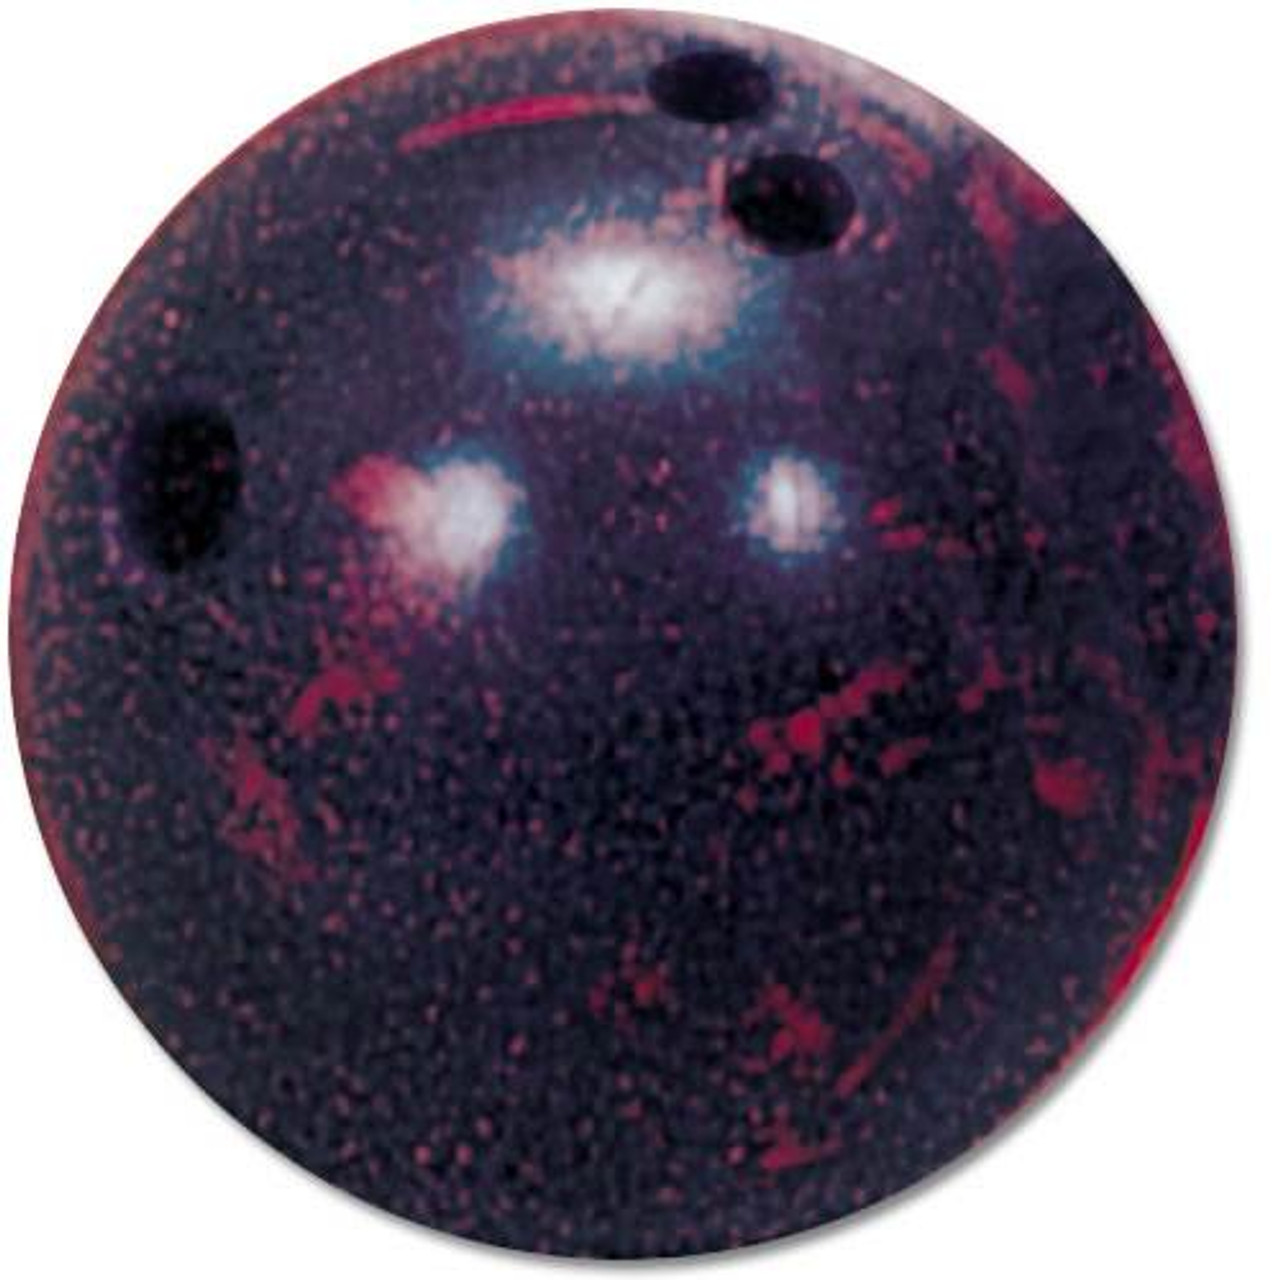 Rubber Bowling Ball - 5 lbs.